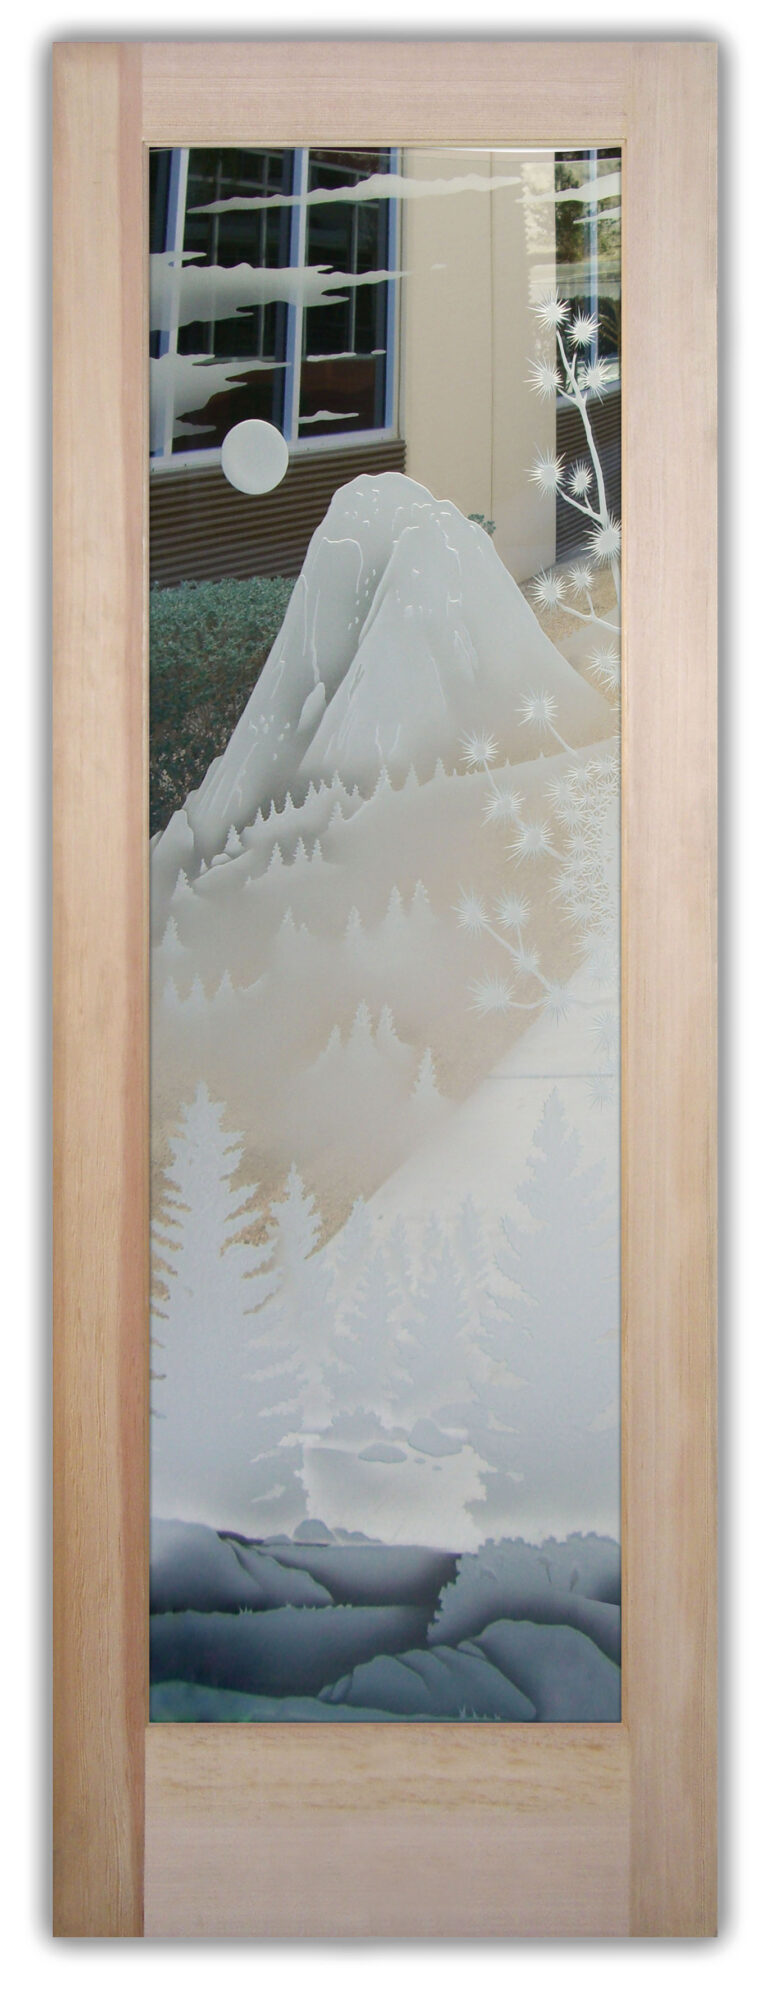 Idyllwild Tahquitz Peak